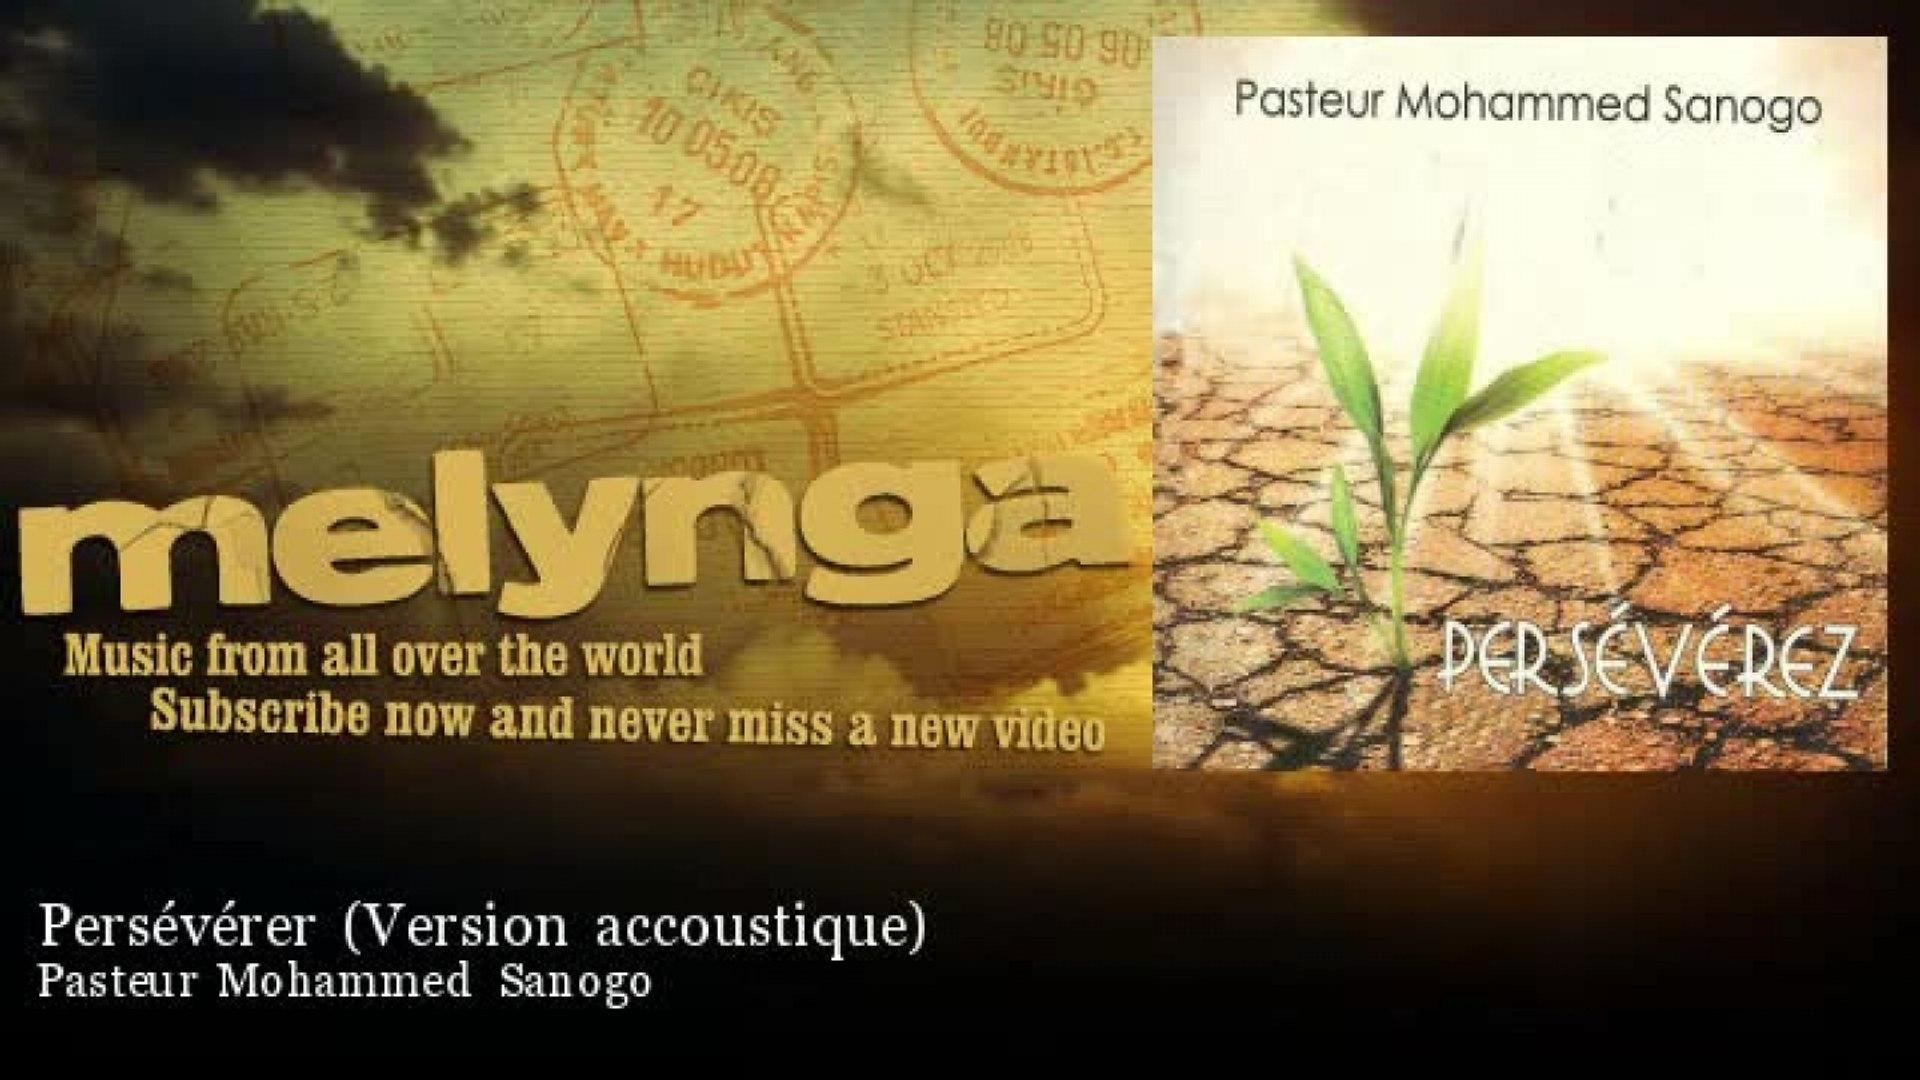 Pasteur Mohammed Sanogo - Persévérer - Version accoustique